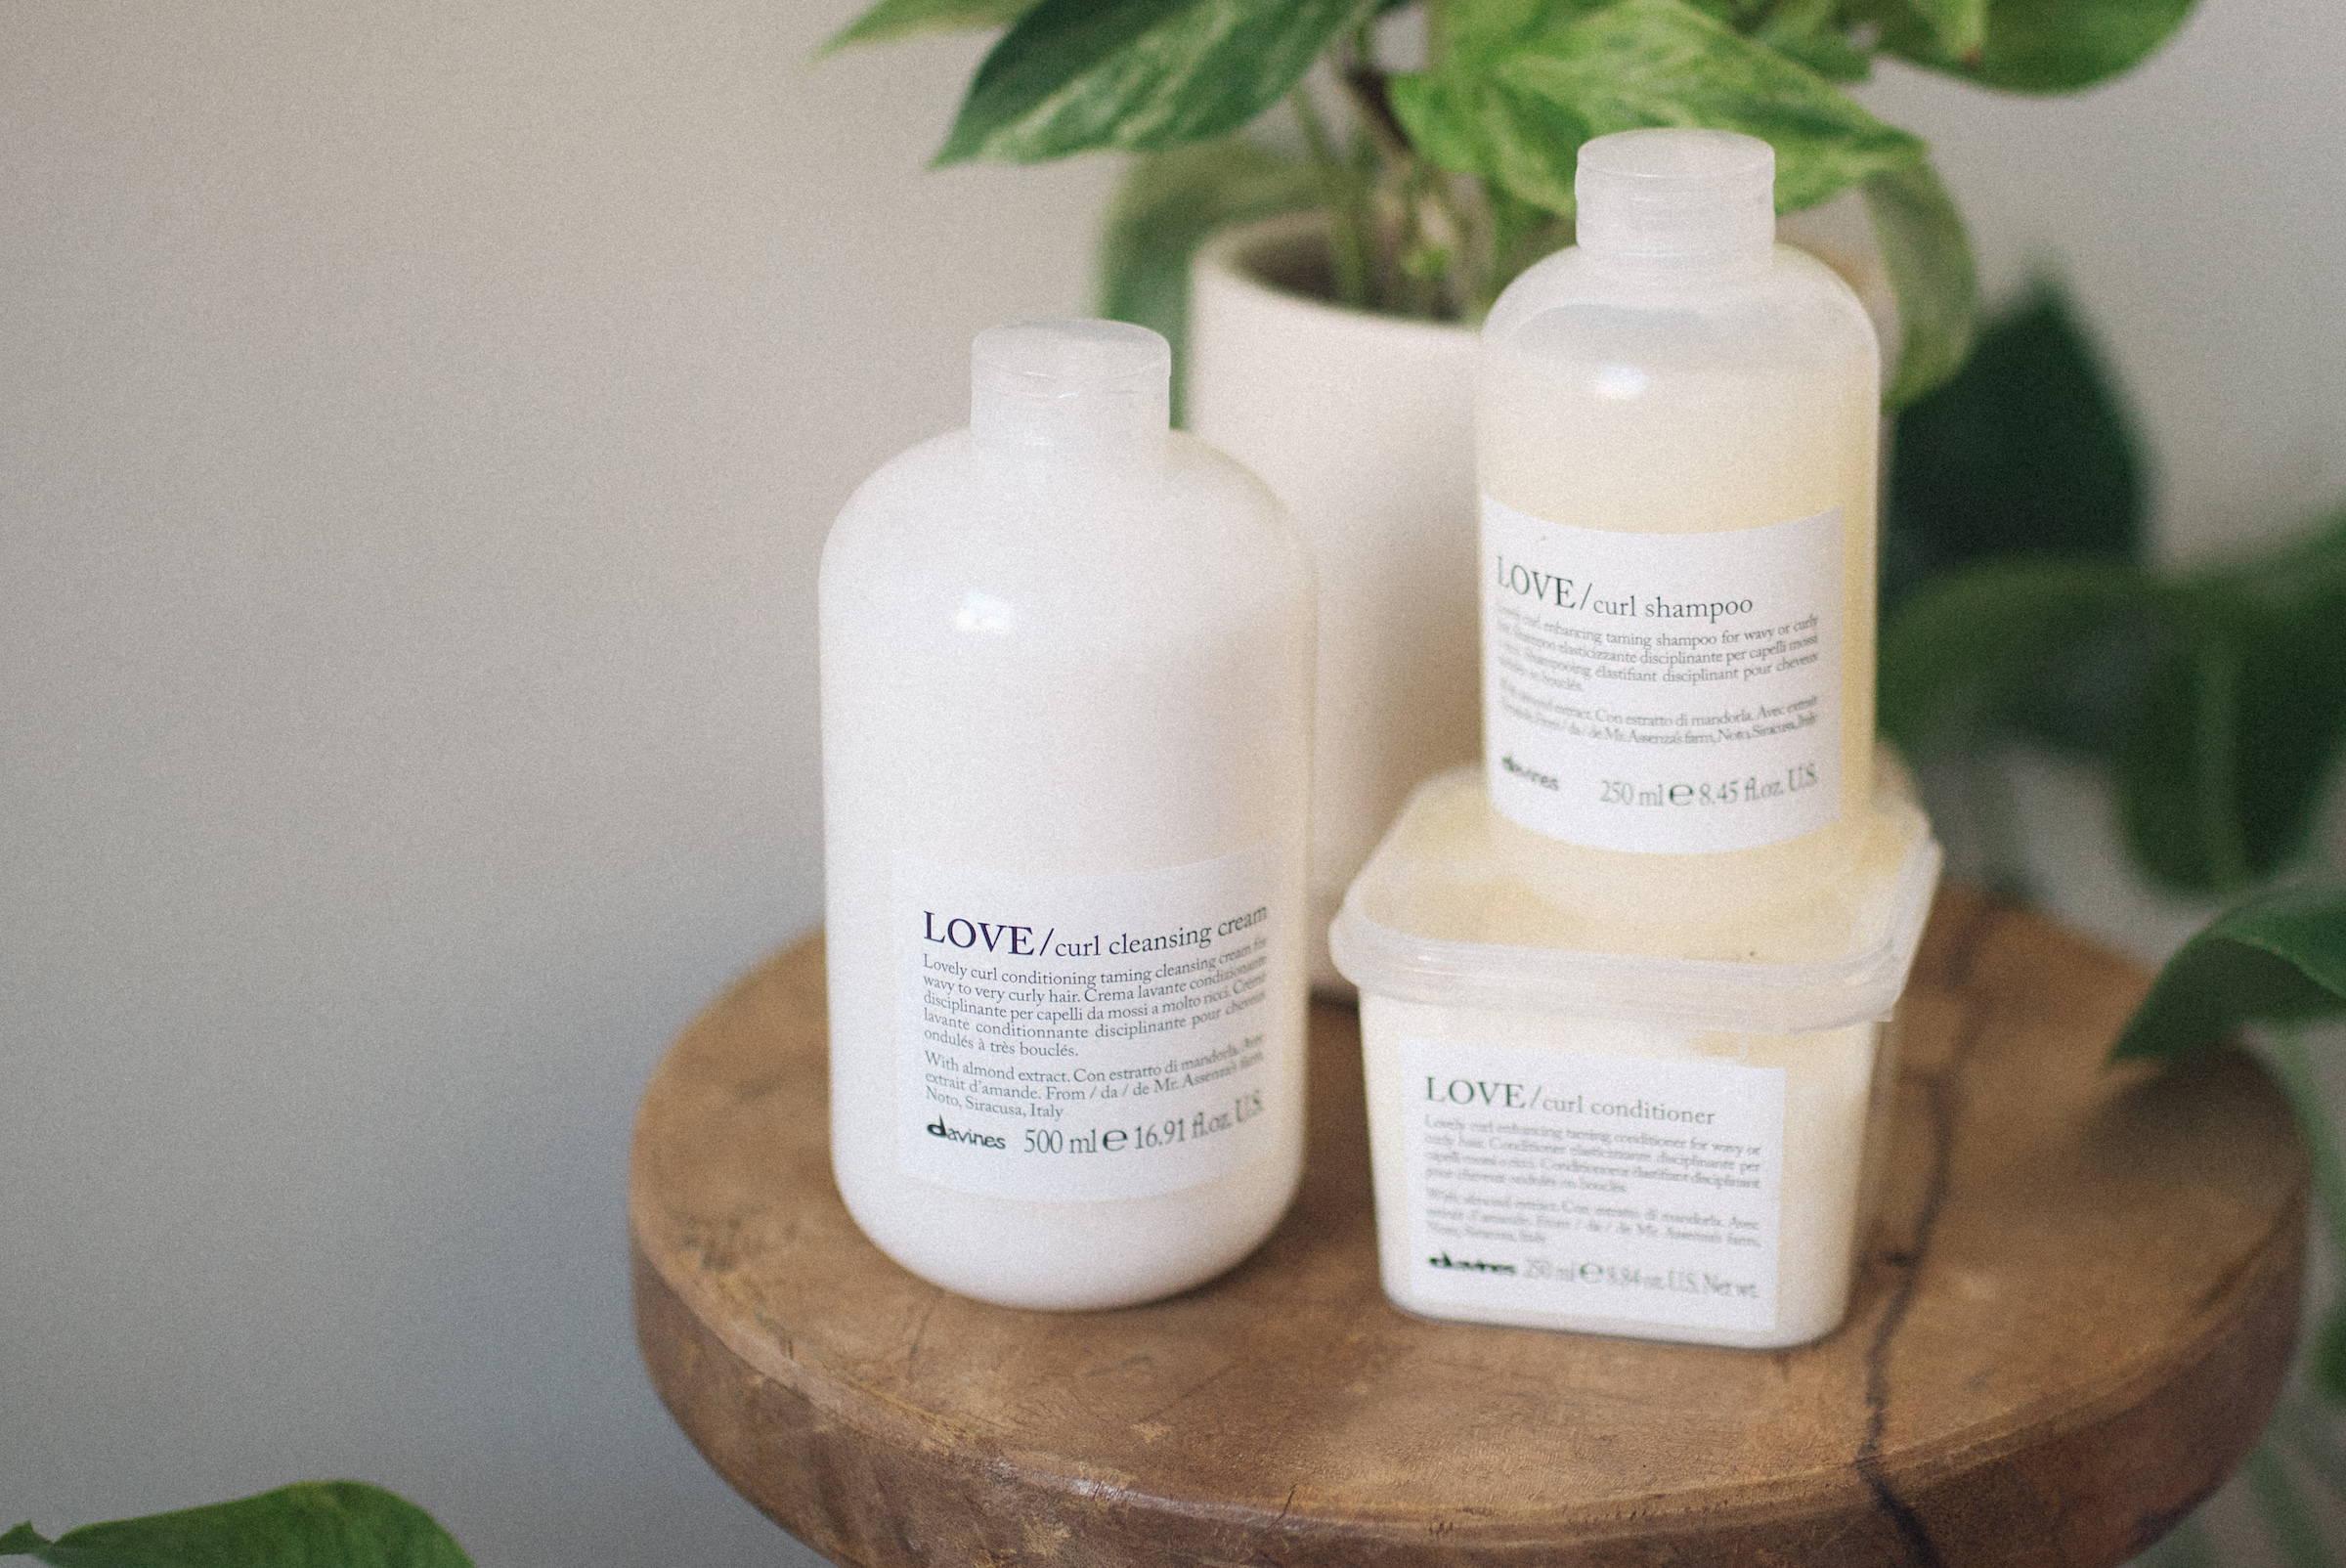 LOVE Curl hair care regimen